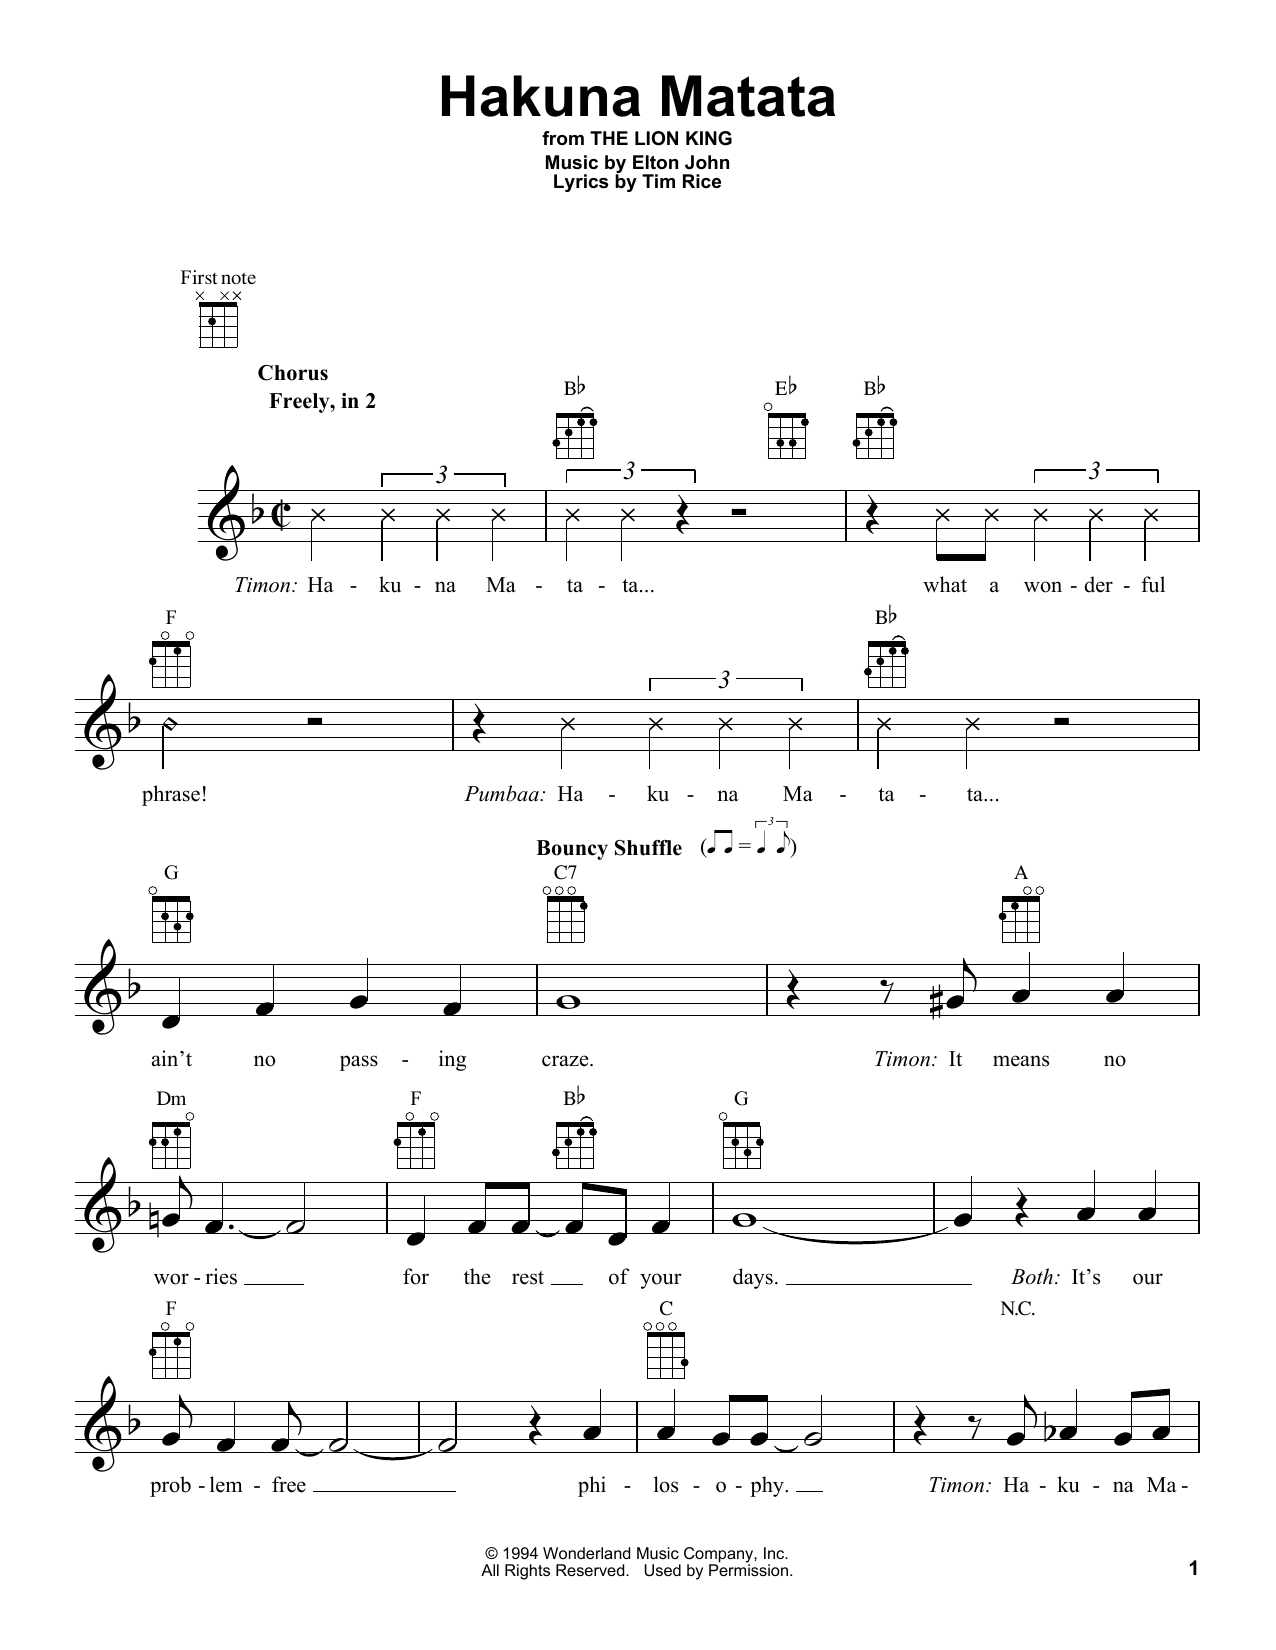 graphic about Disney Piano Sheet Music Free Printable known as Elton John Tim Rice Hakuna Matata (towards The Lion King) Sheet Songs Notes, Chords Down load Printable Ukulele - SKU: 415058